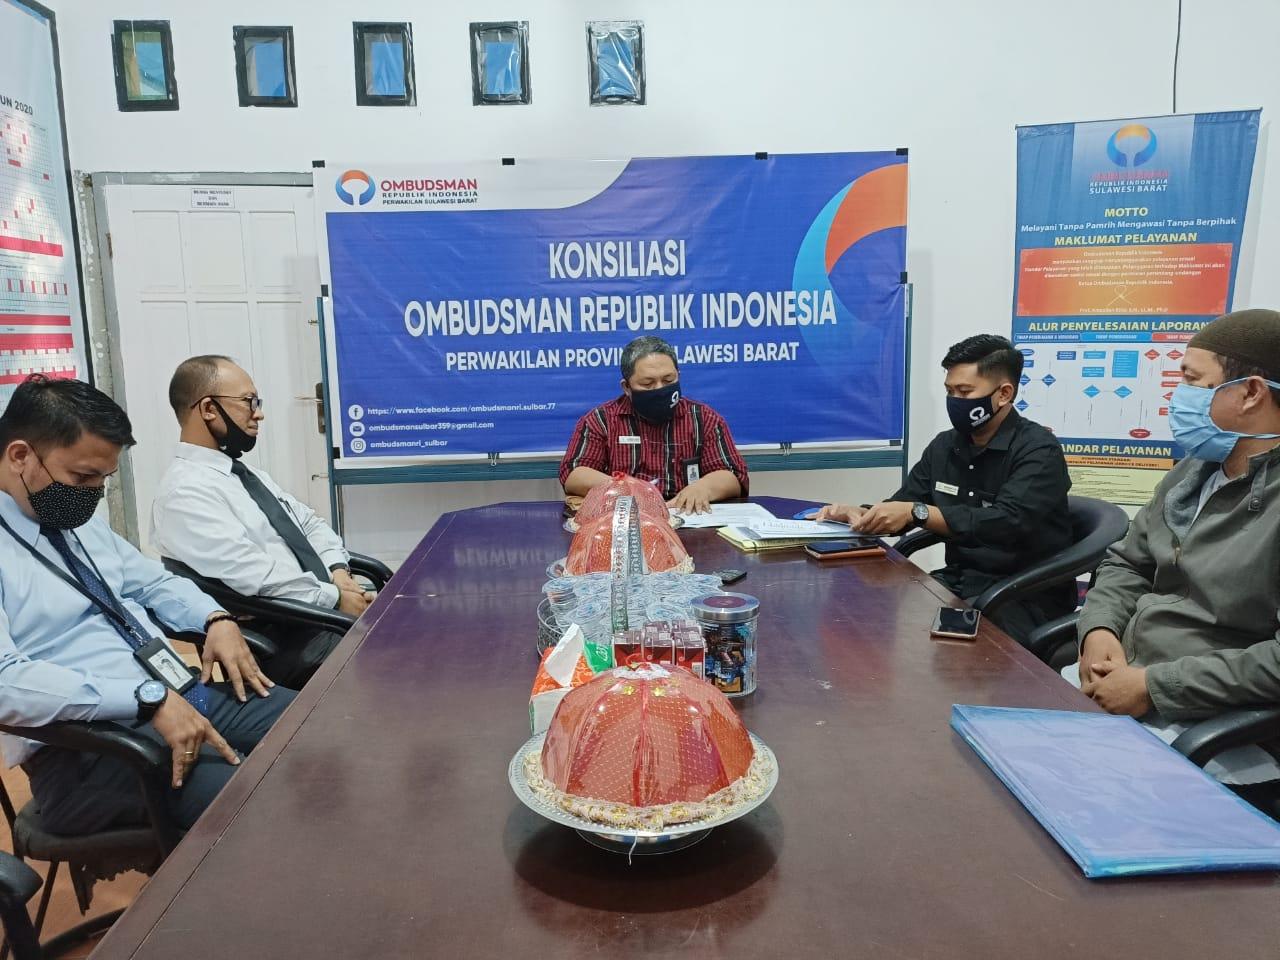 img Ombudsman Gelar Konsiliasi Dugaan Maladministrasi di BPD Sulselbar